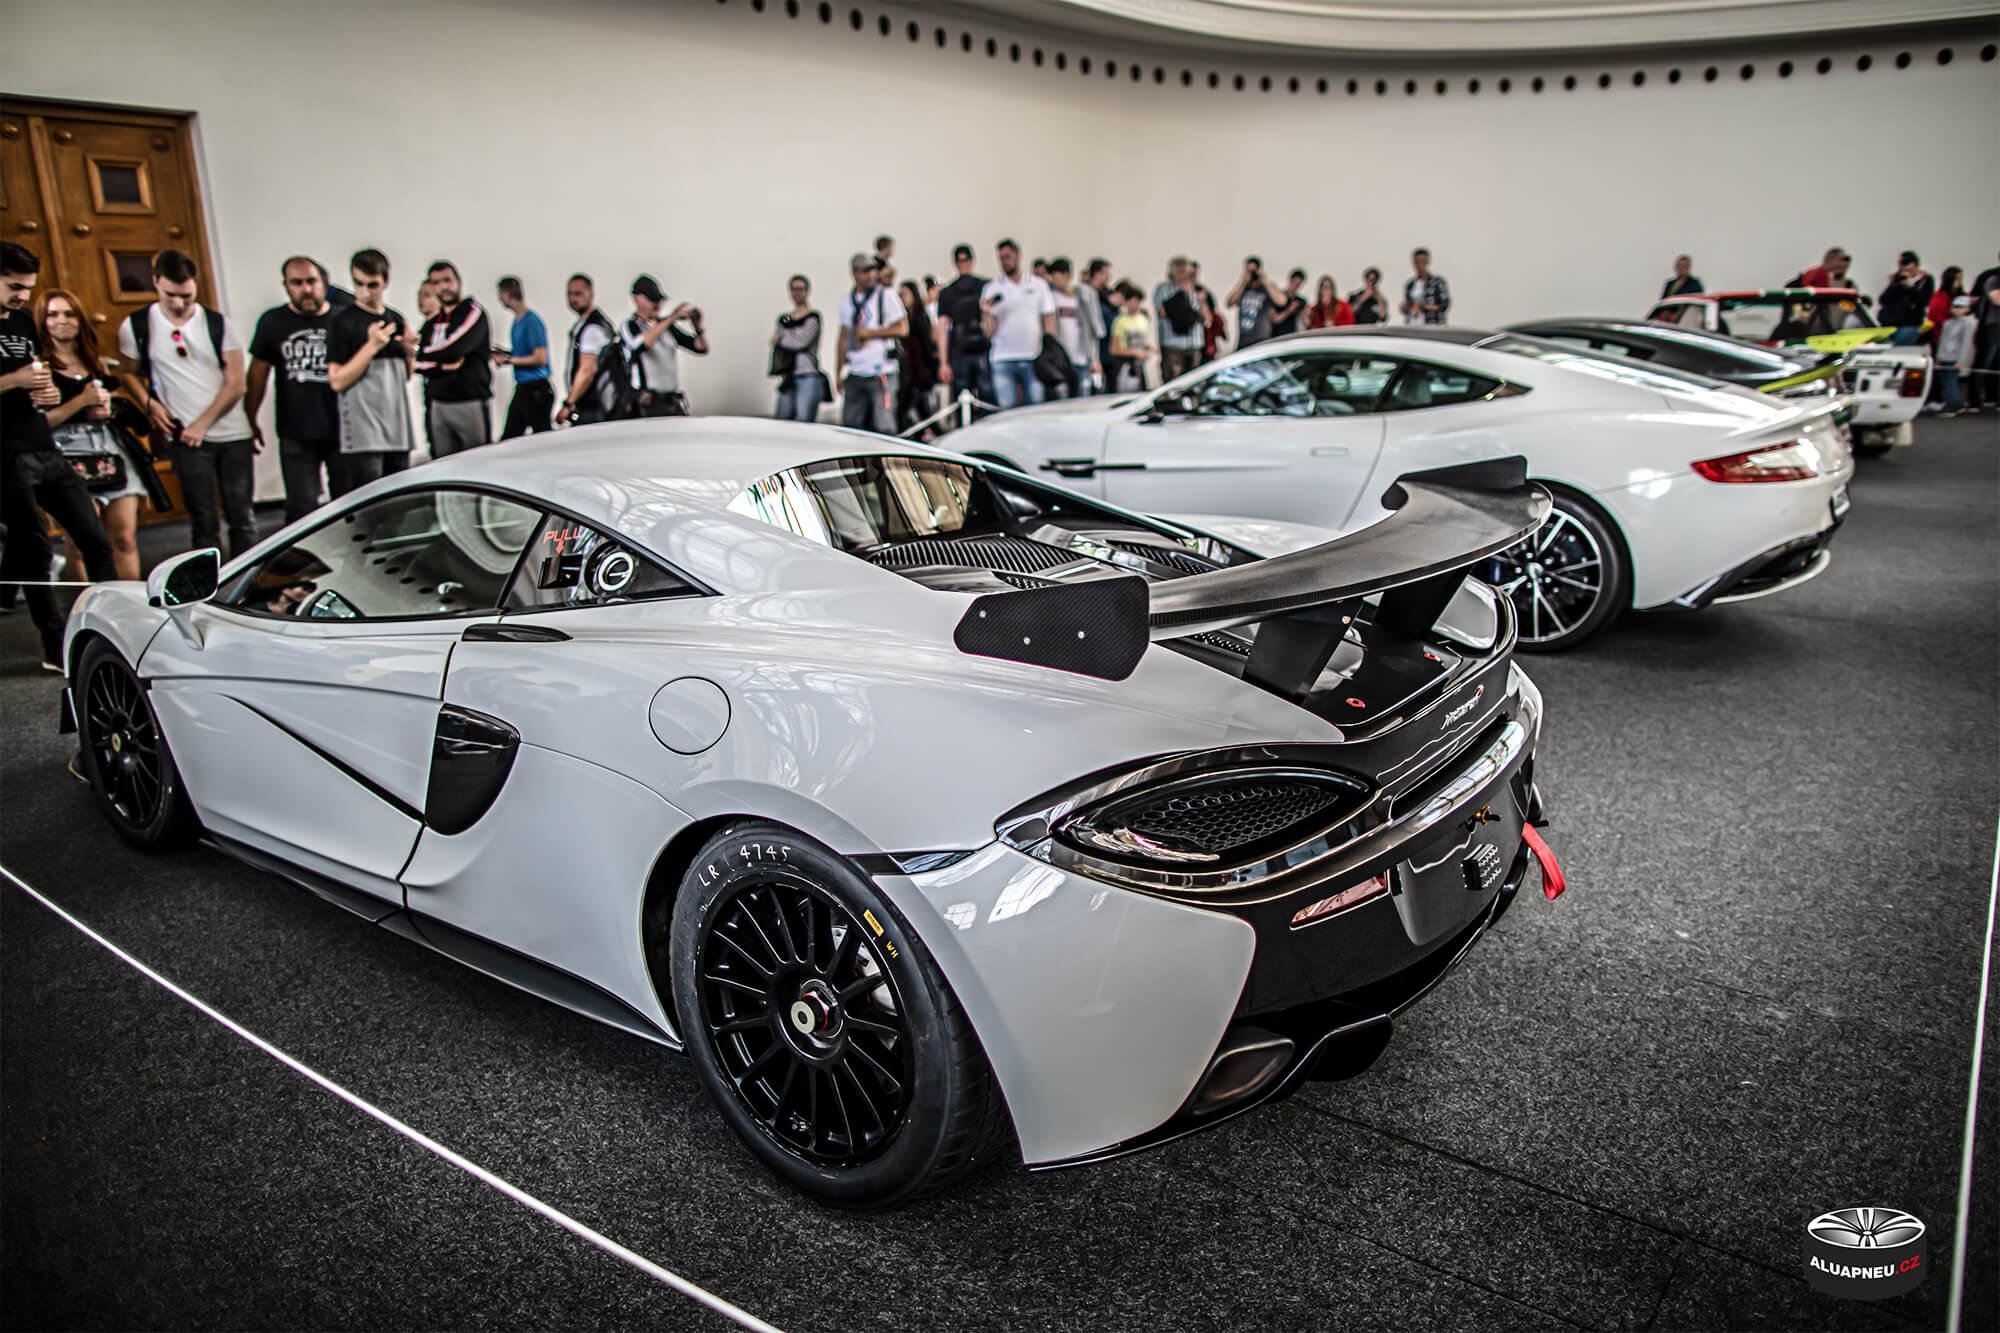 Černá alu kola McLaren - originální elektrony - Automobilové Legendy 2019 - www.aluapneu.cz